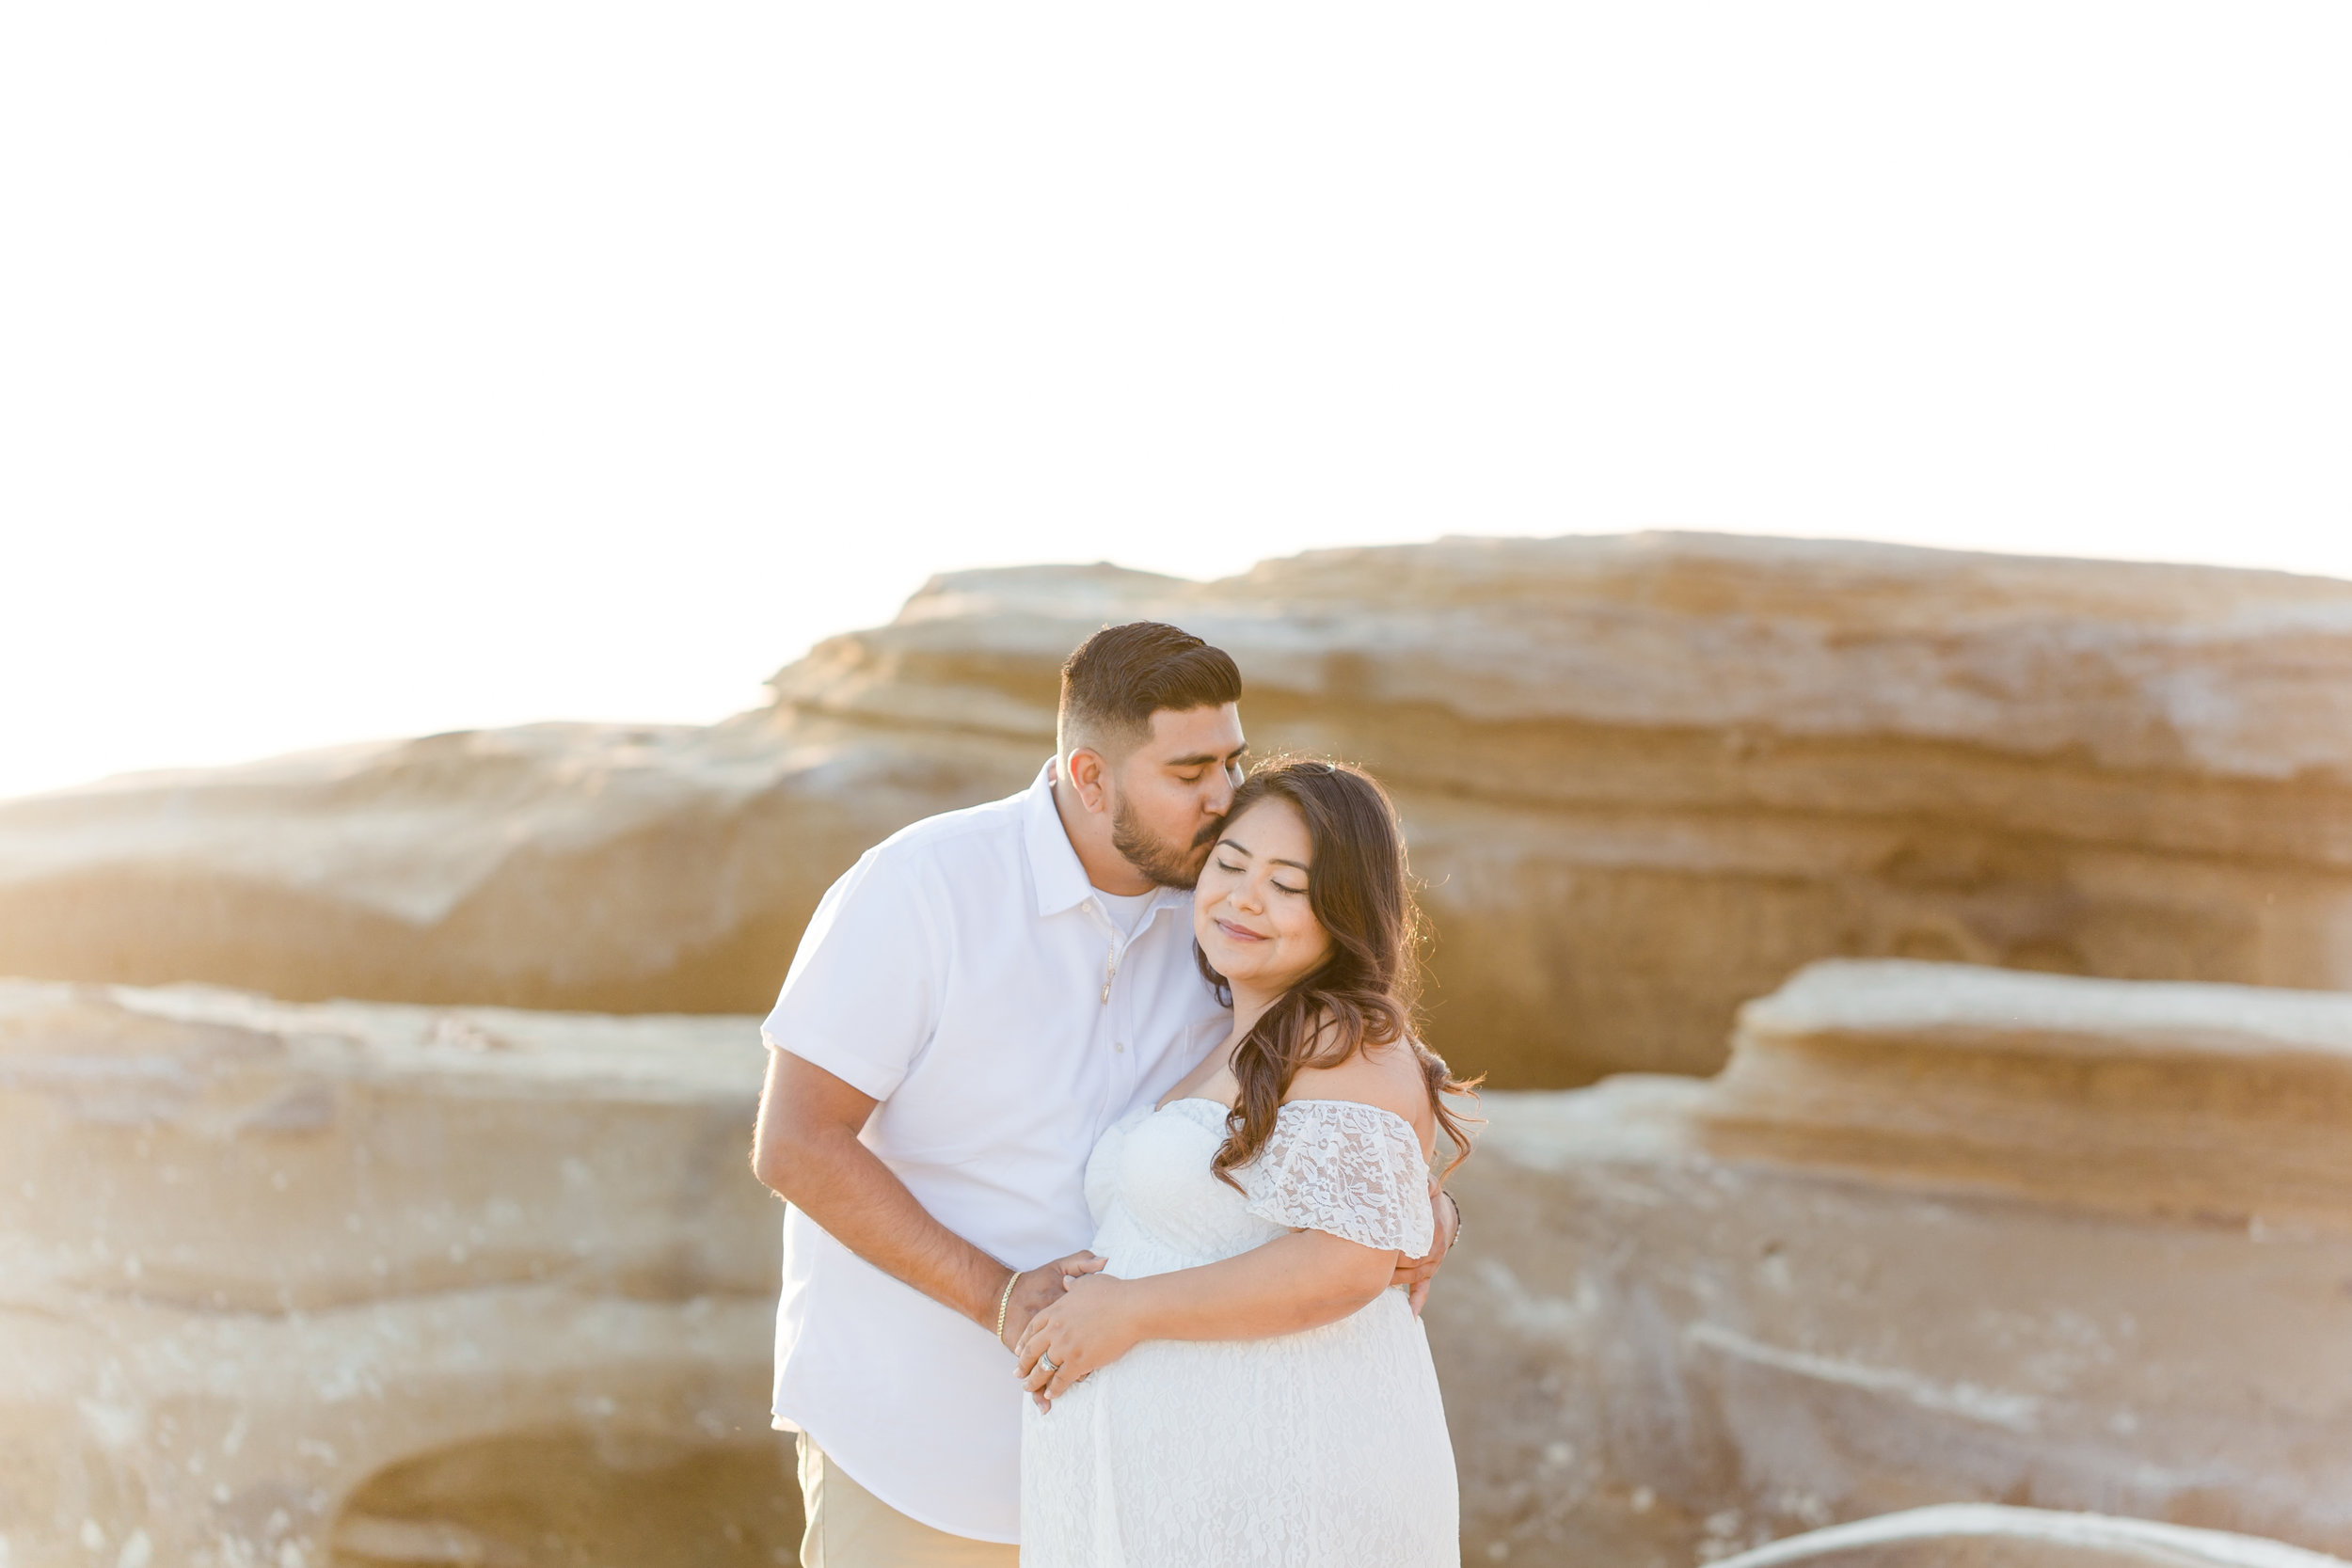 Karina Family Maternity | Windansea Beach Maternity Photos